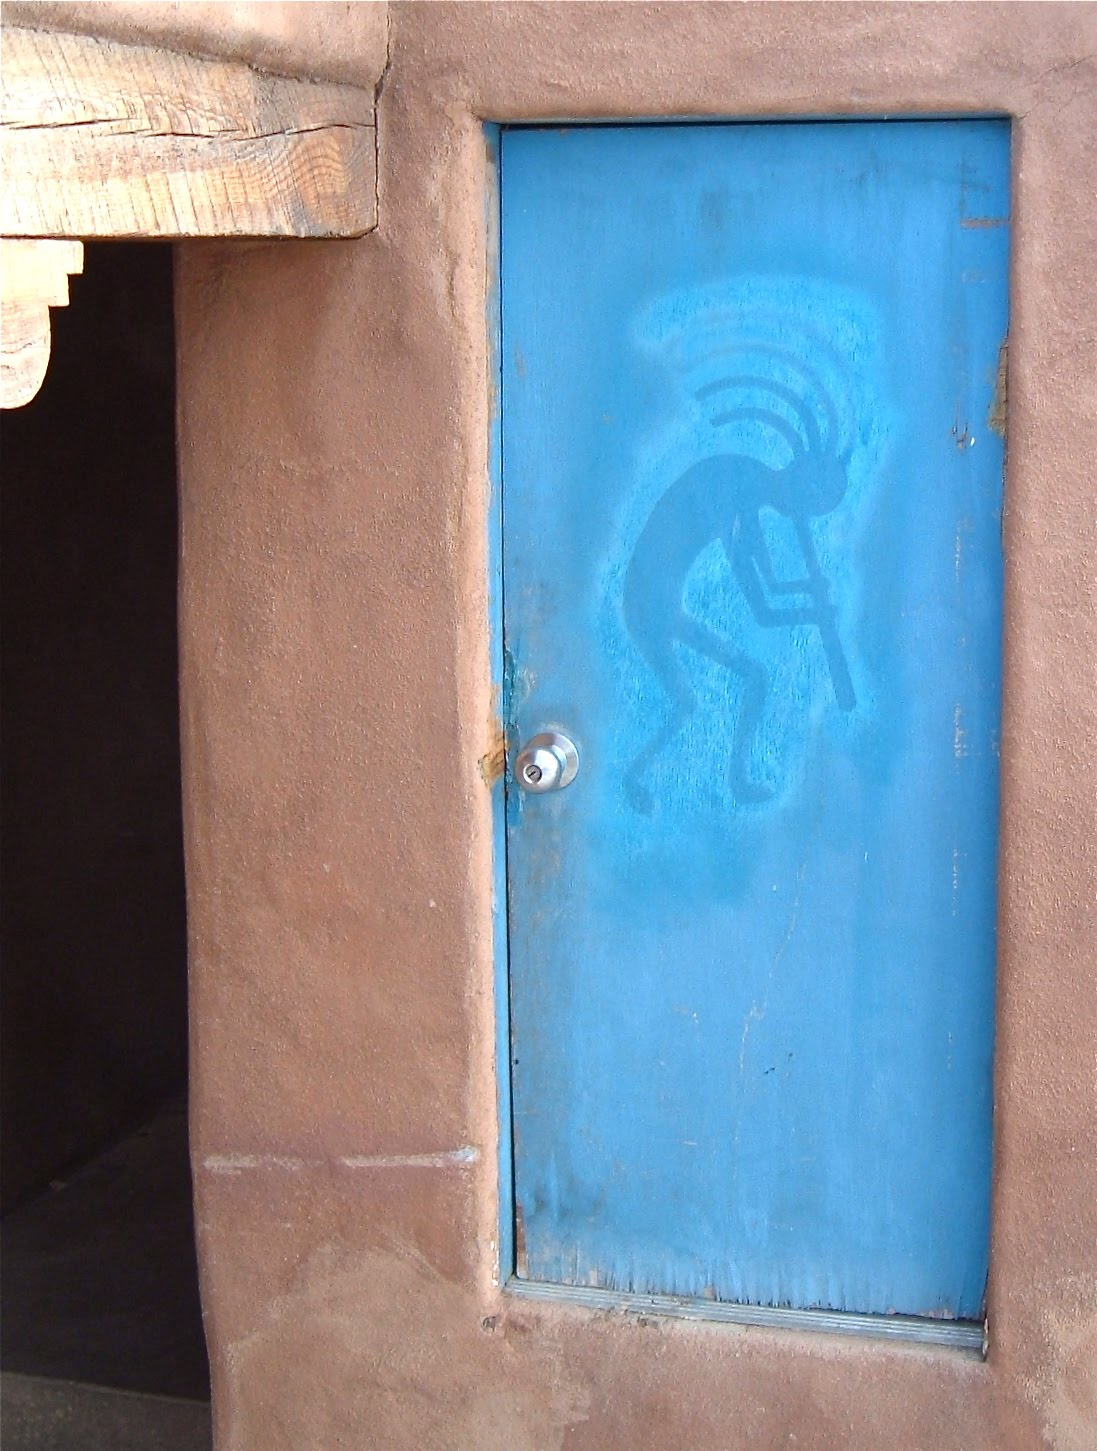 Two Graces Taos \u201cThe Secret of Taos Blue Doors\u201d Robert Cafazzo (copyright 2011) & Two Graces Taos: \u201cThe Secret of Taos Blue Doors\u201d Robert Cafazzo ...